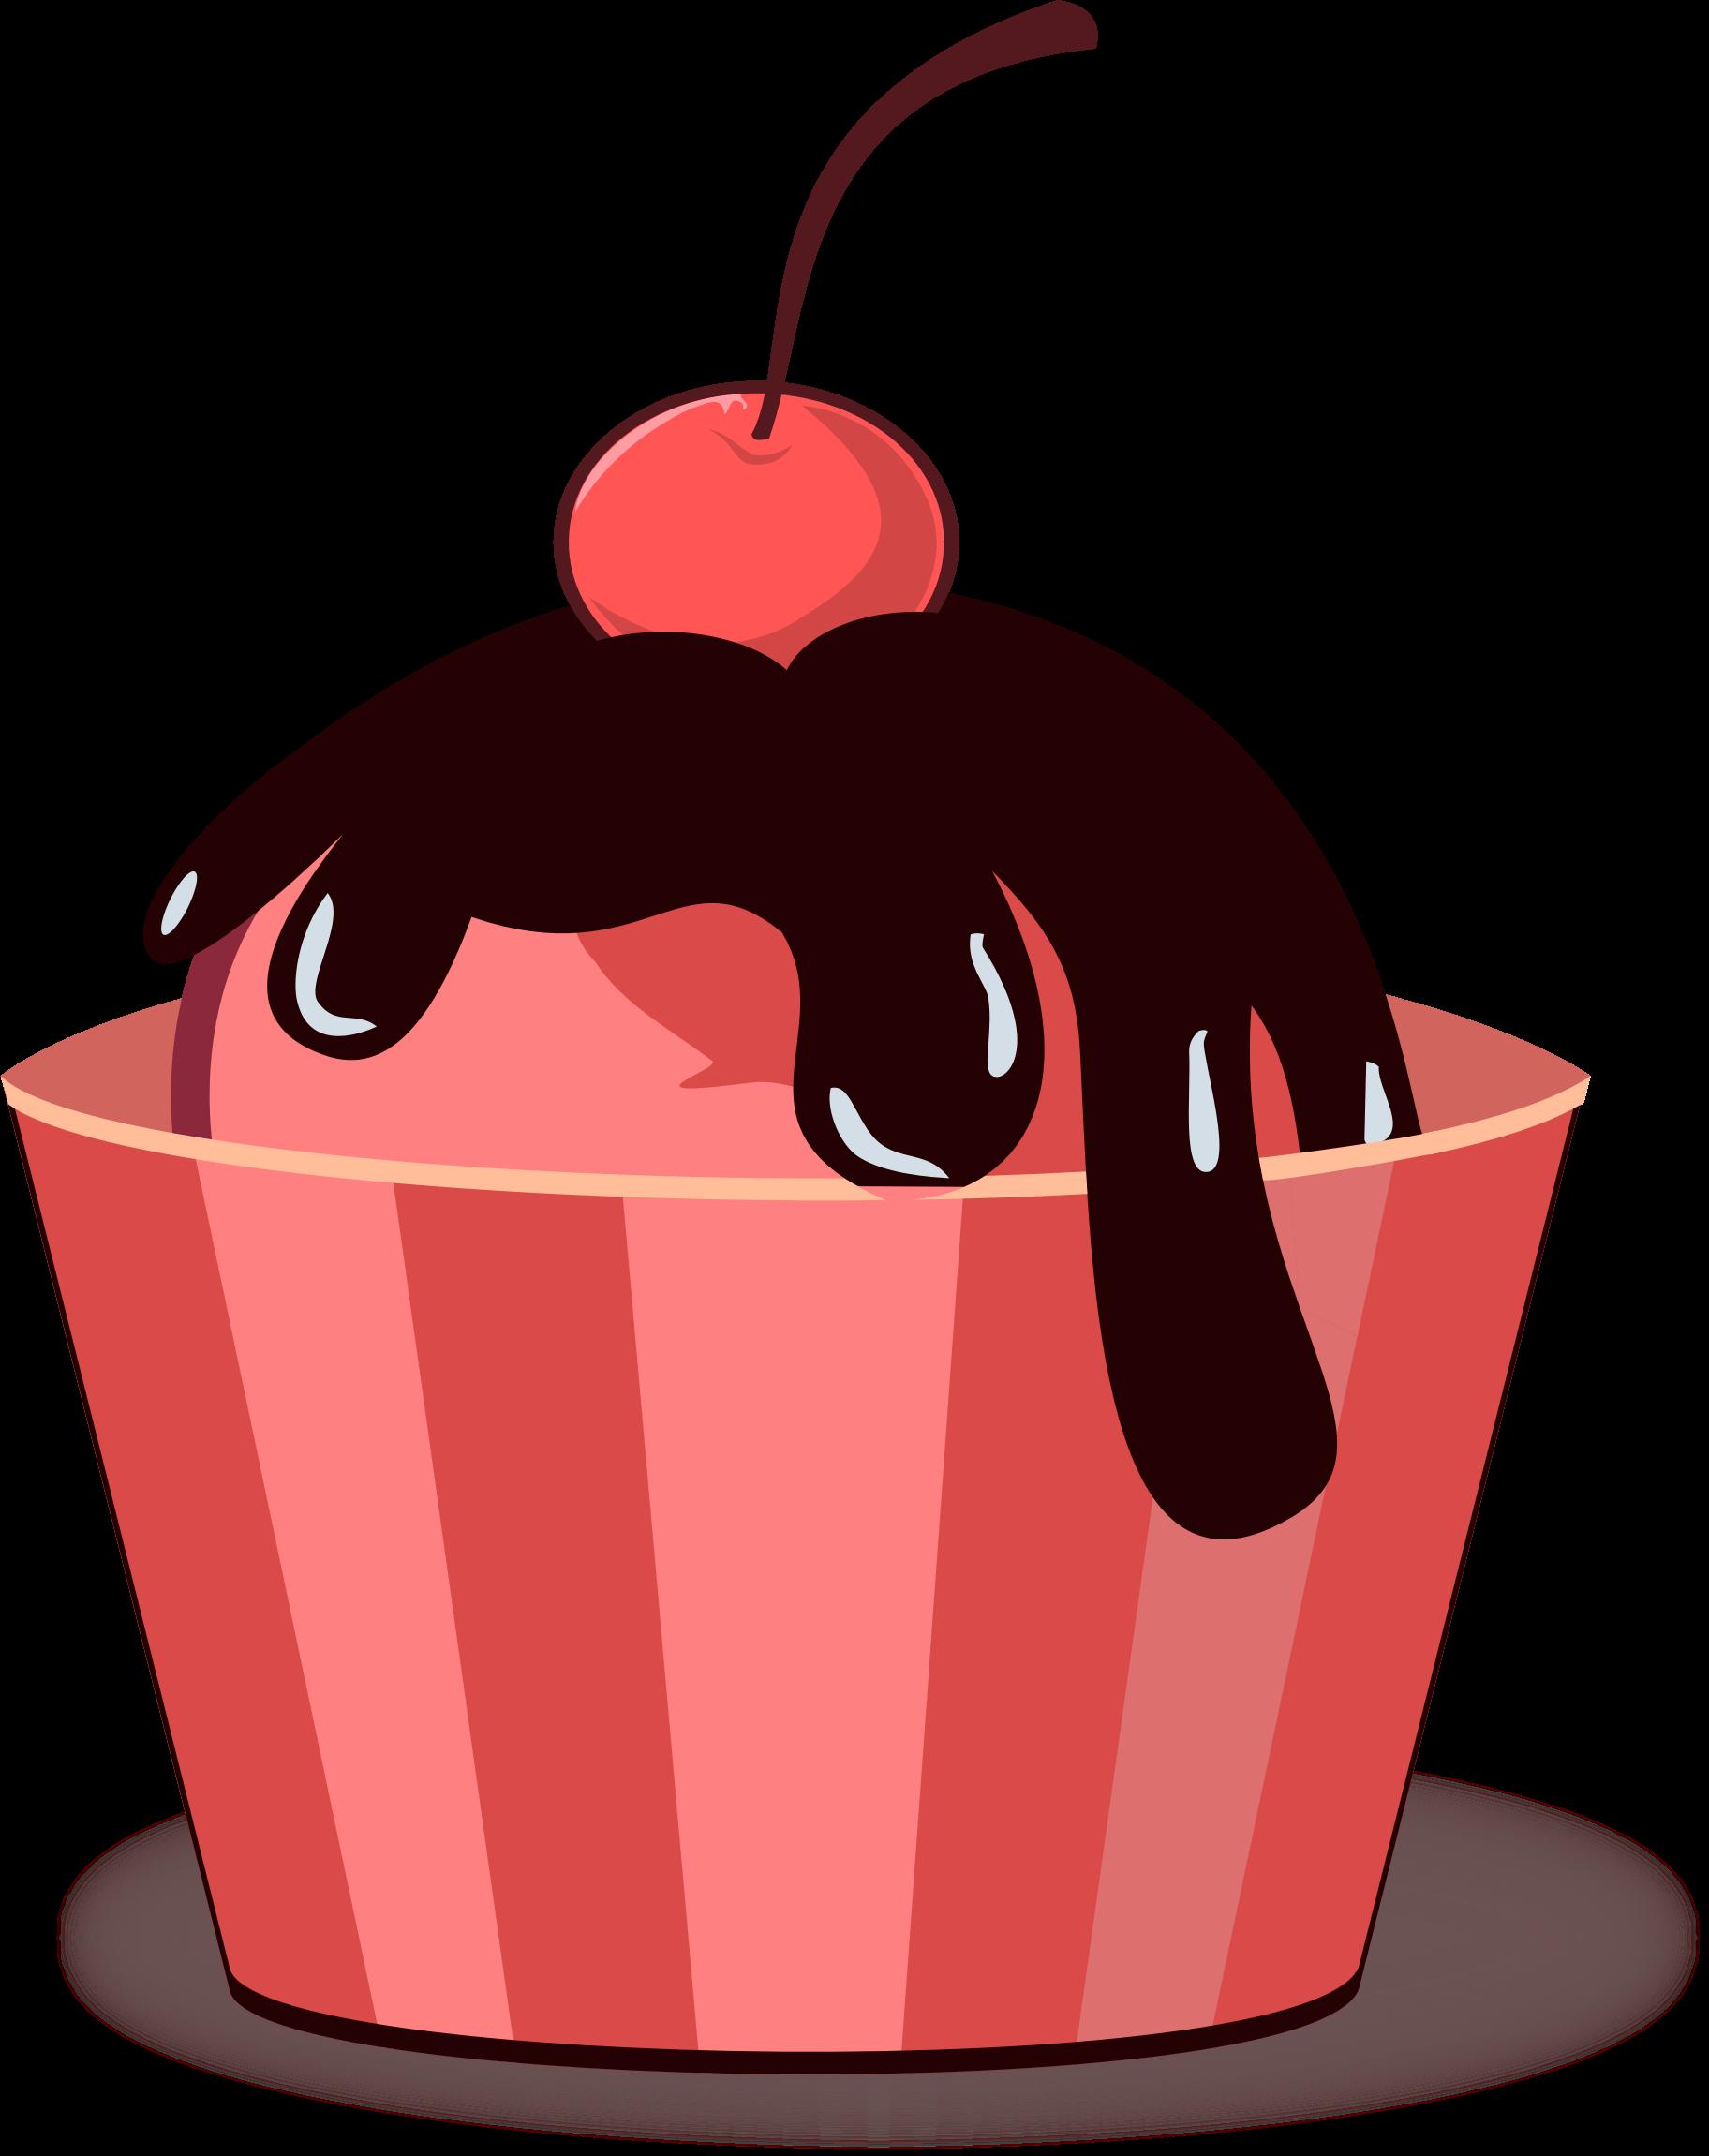 Vector ice cream big. Icecream clipart red